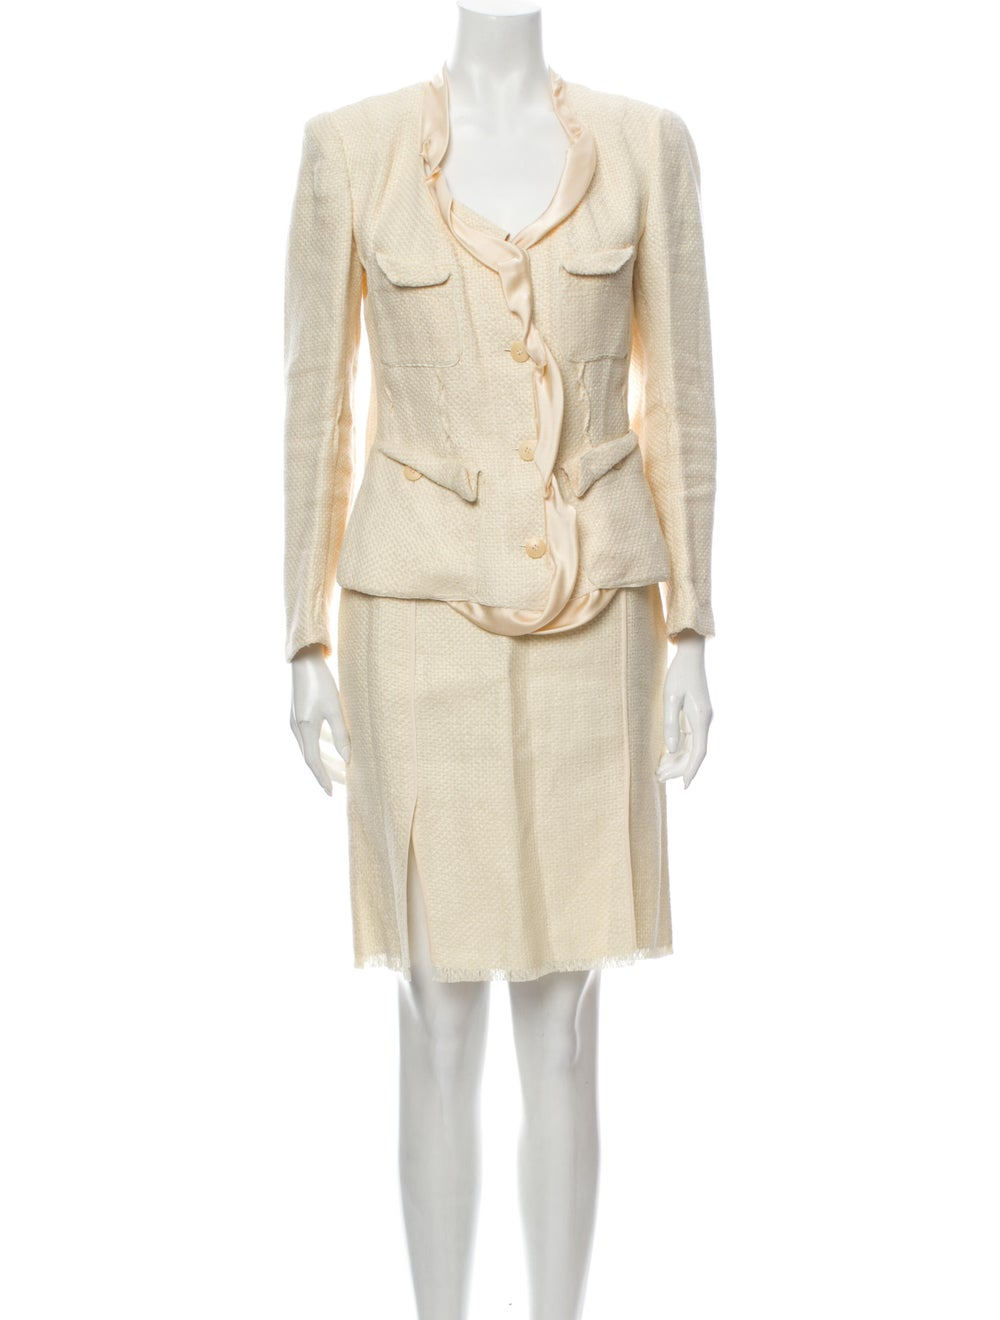 Donna Karan Linen Skirt Suit - image 1